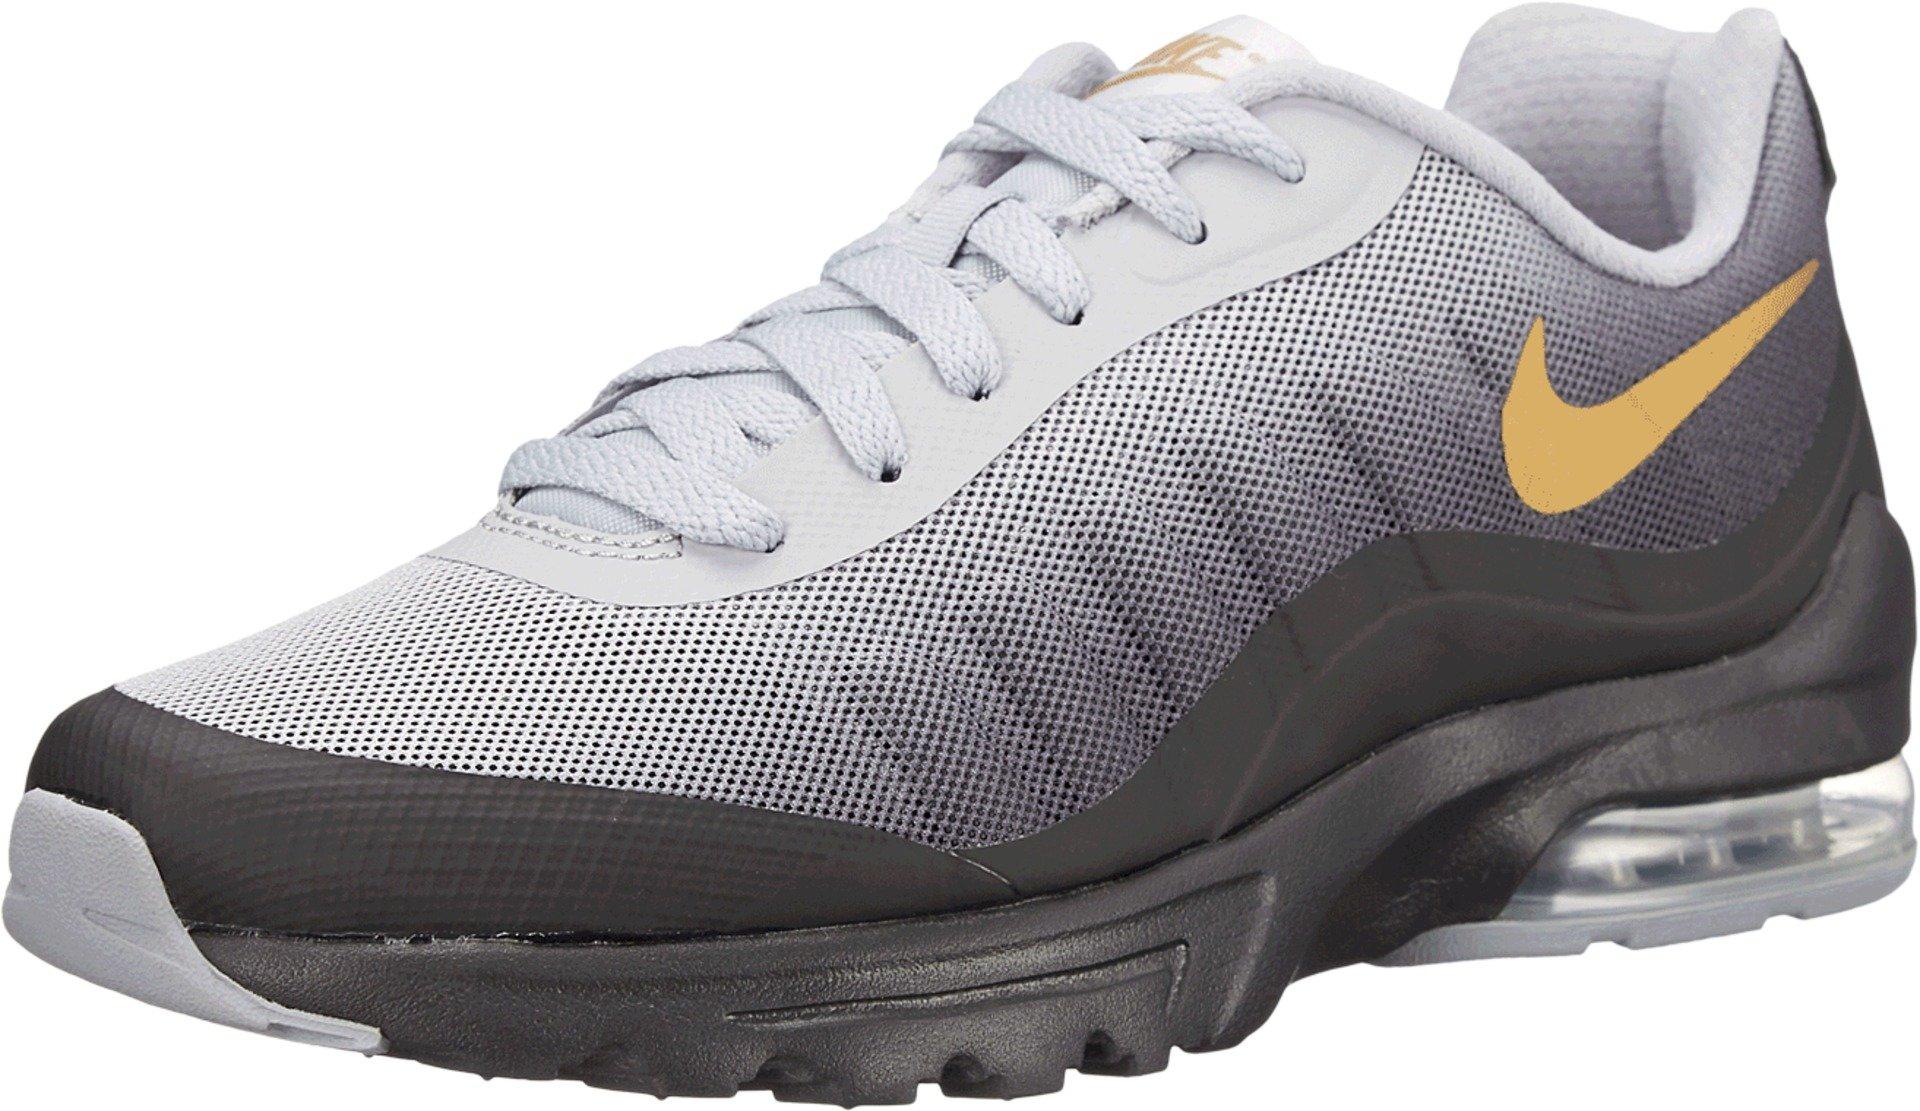 Galleon Nike W Air Max Invigor Print Womens 749862 070 Size 12